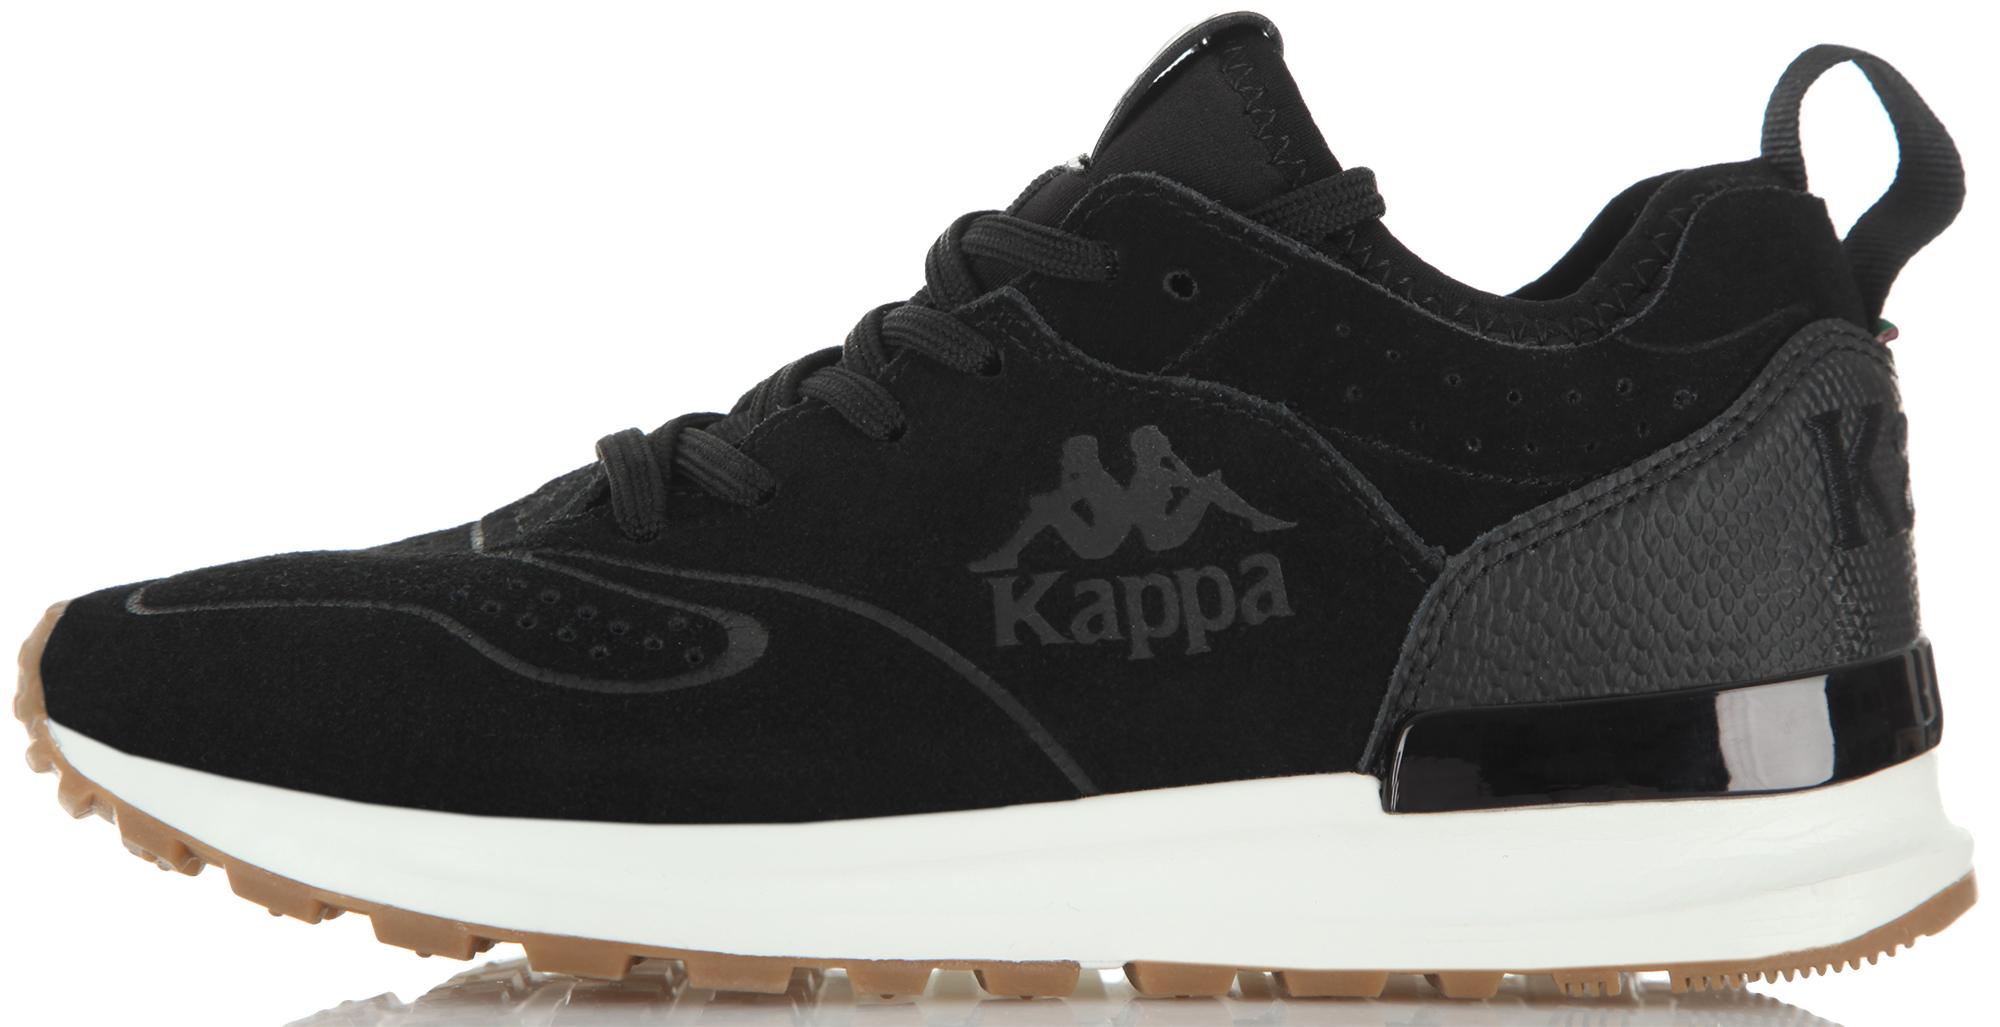 Kappa Кроссовки женские Kappa Neoclassic, размер 38,5 kappa кроссовки женские kappa linea